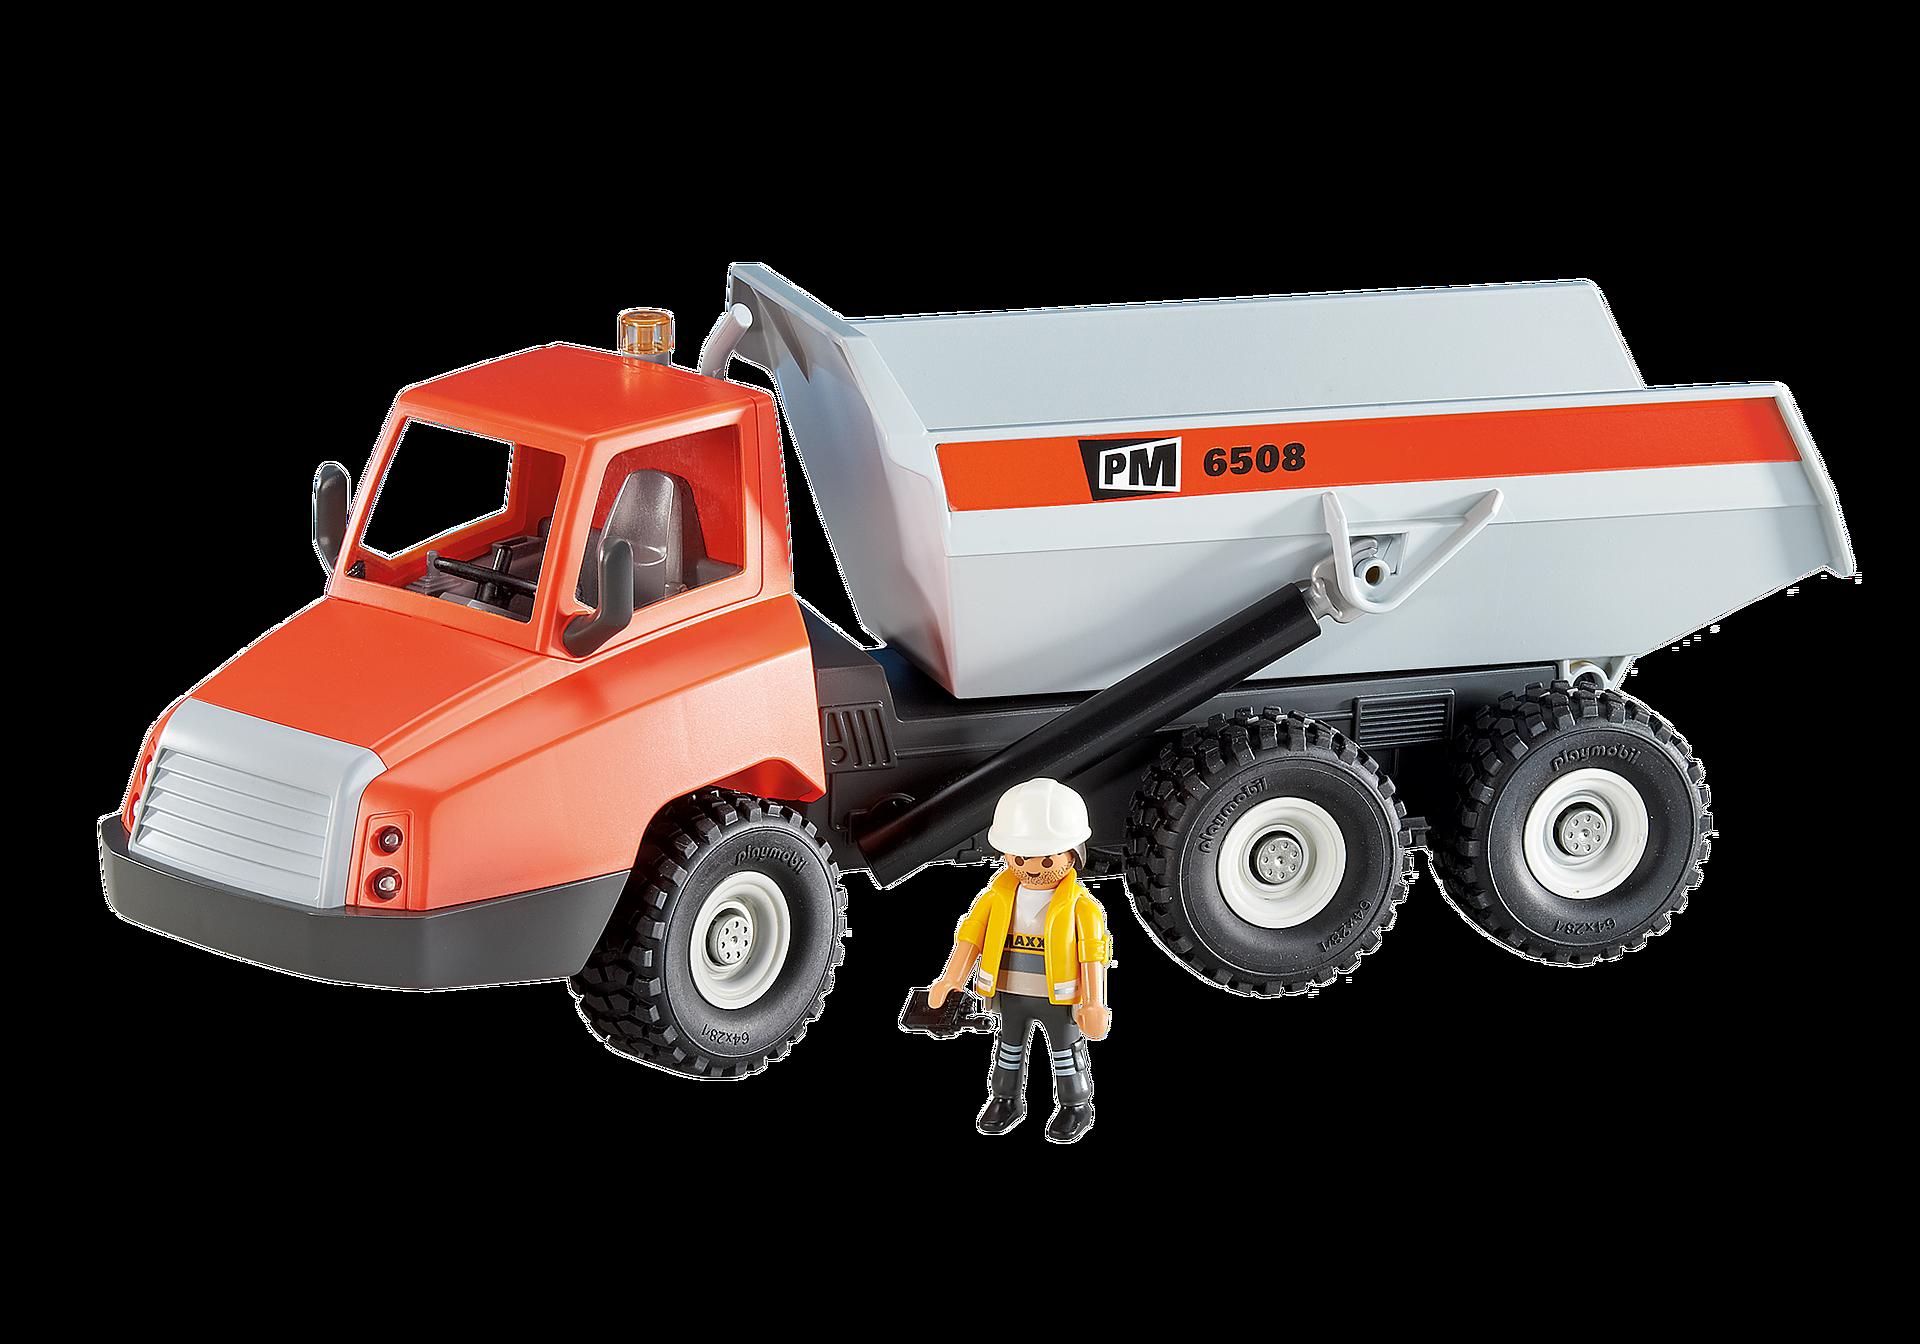 http://media.playmobil.com/i/playmobil/6508_product_detail/Camion con cassone ribaltabile